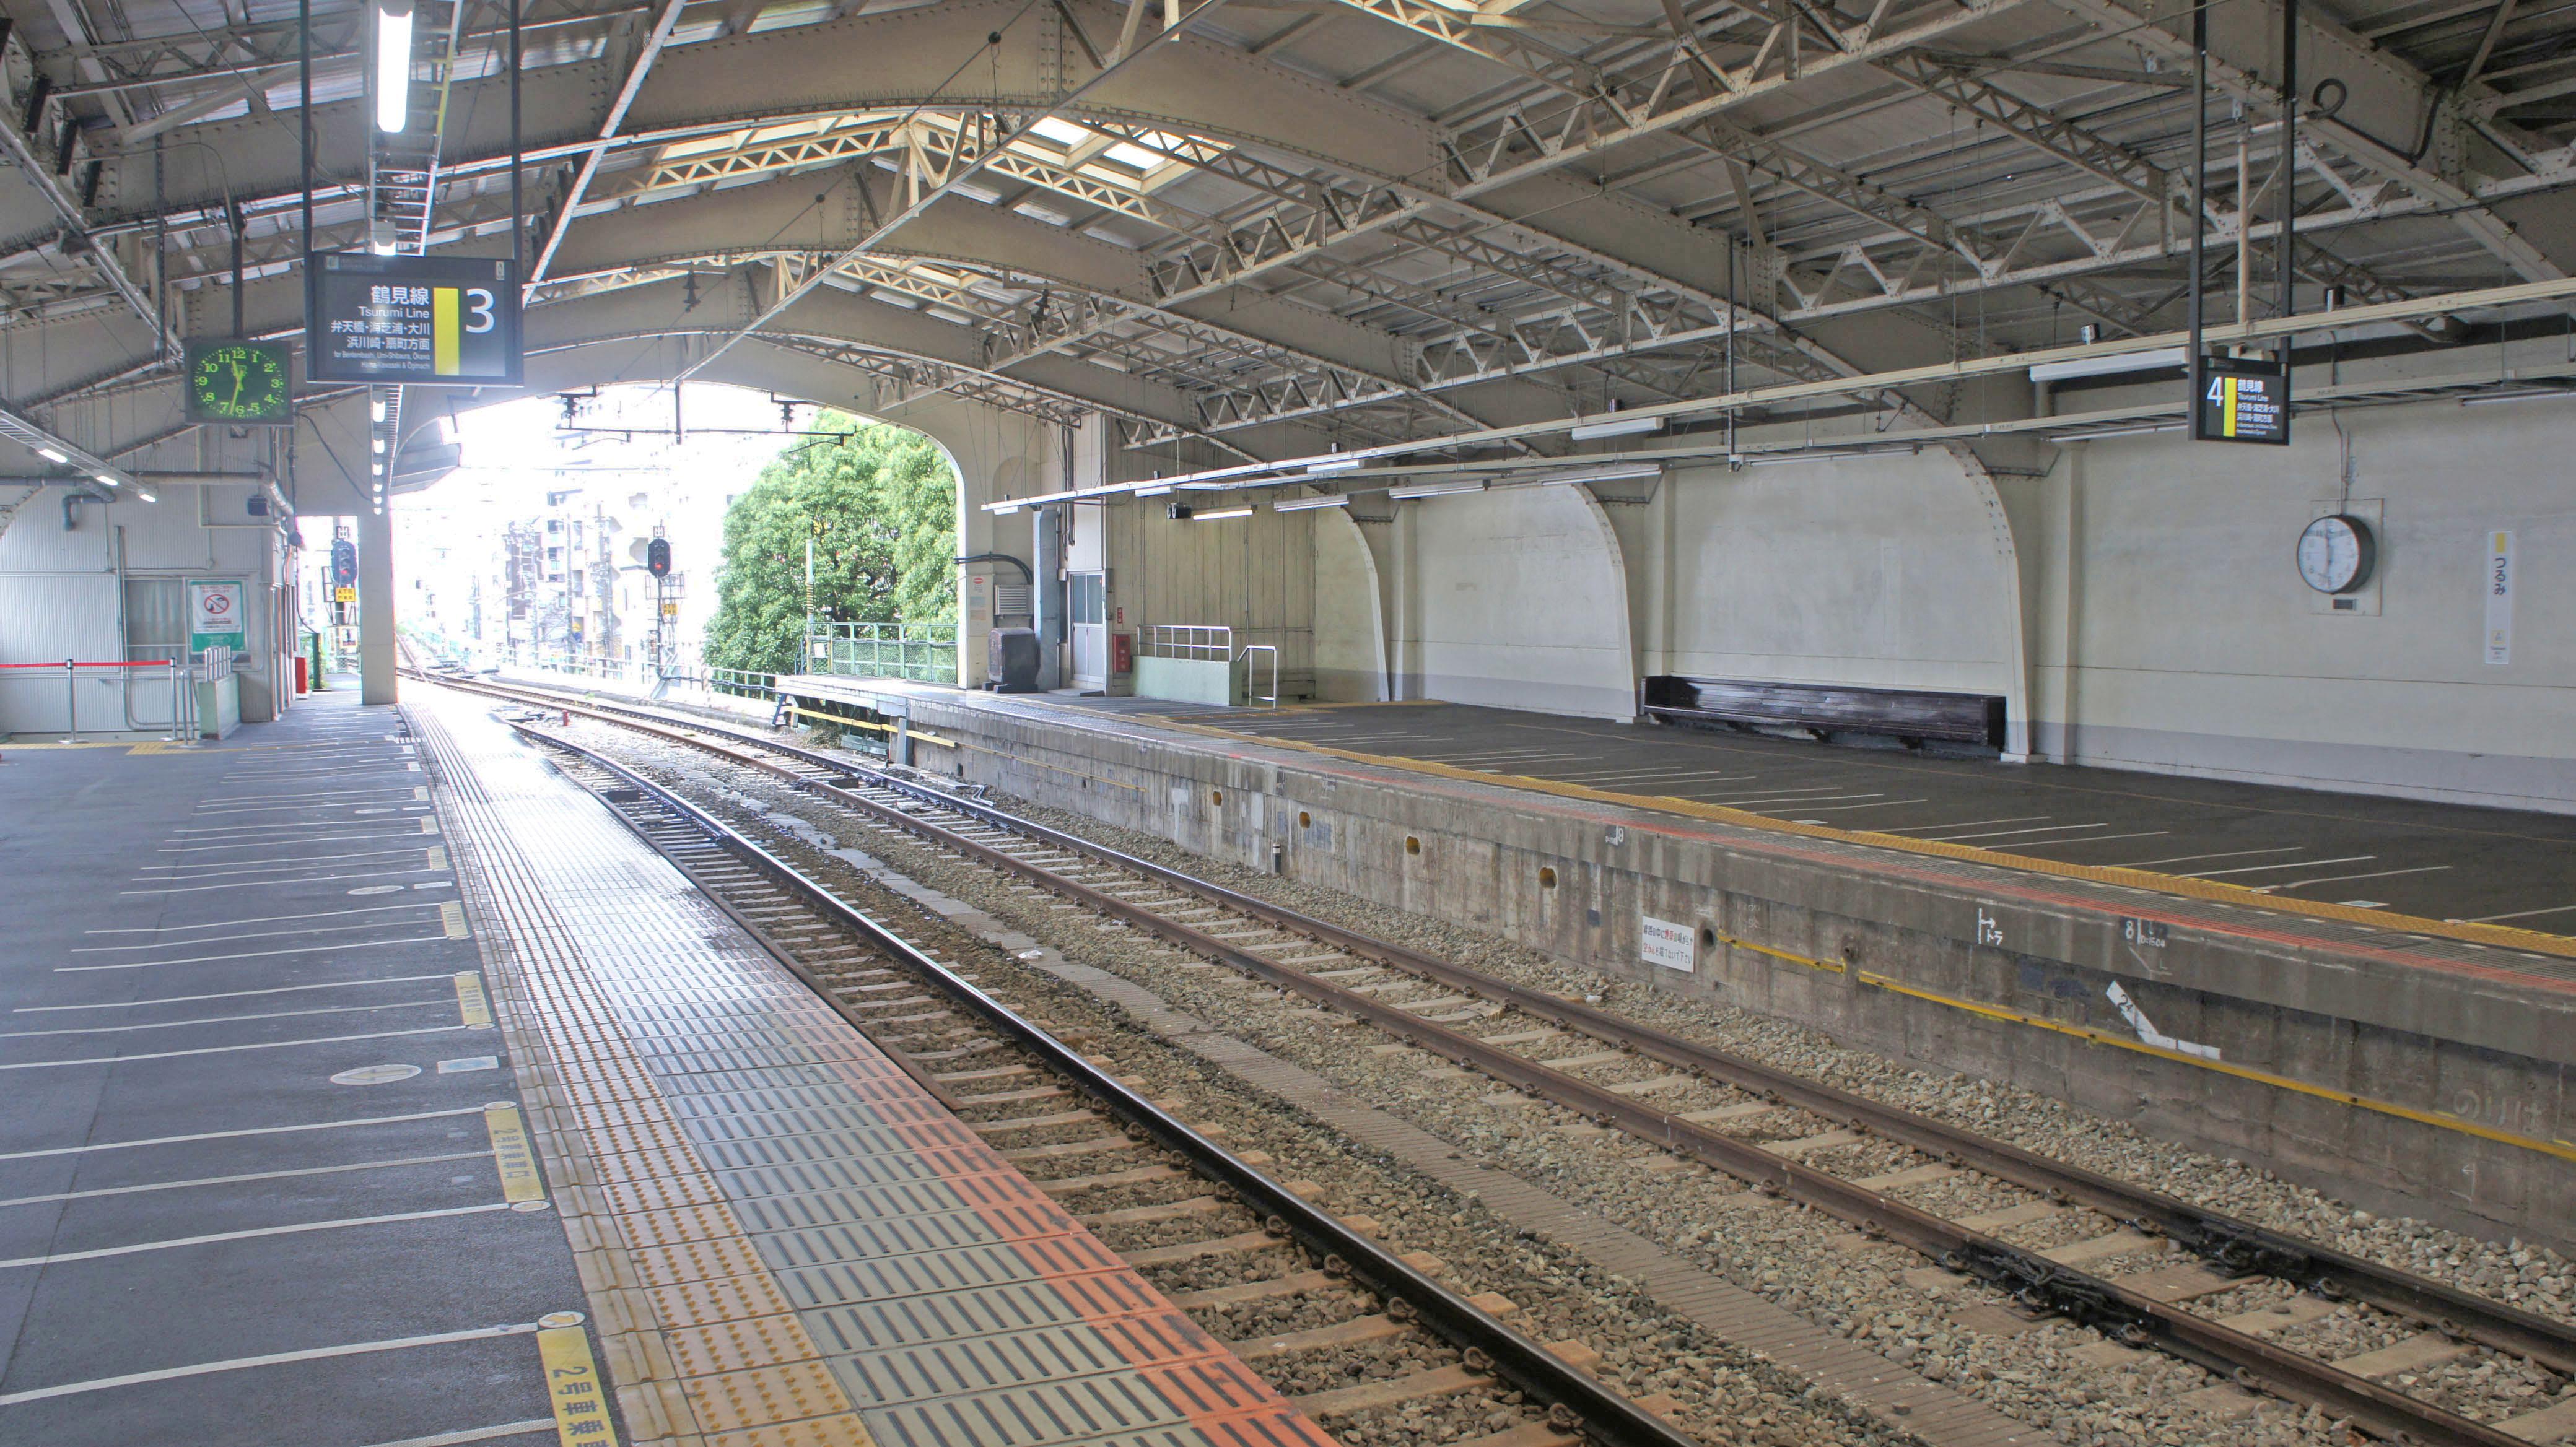 https://upload.wikimedia.org/wikipedia/commons/4/44/JR_Tsurumi_Station_Platform_3%E3%83%BB4.jpg